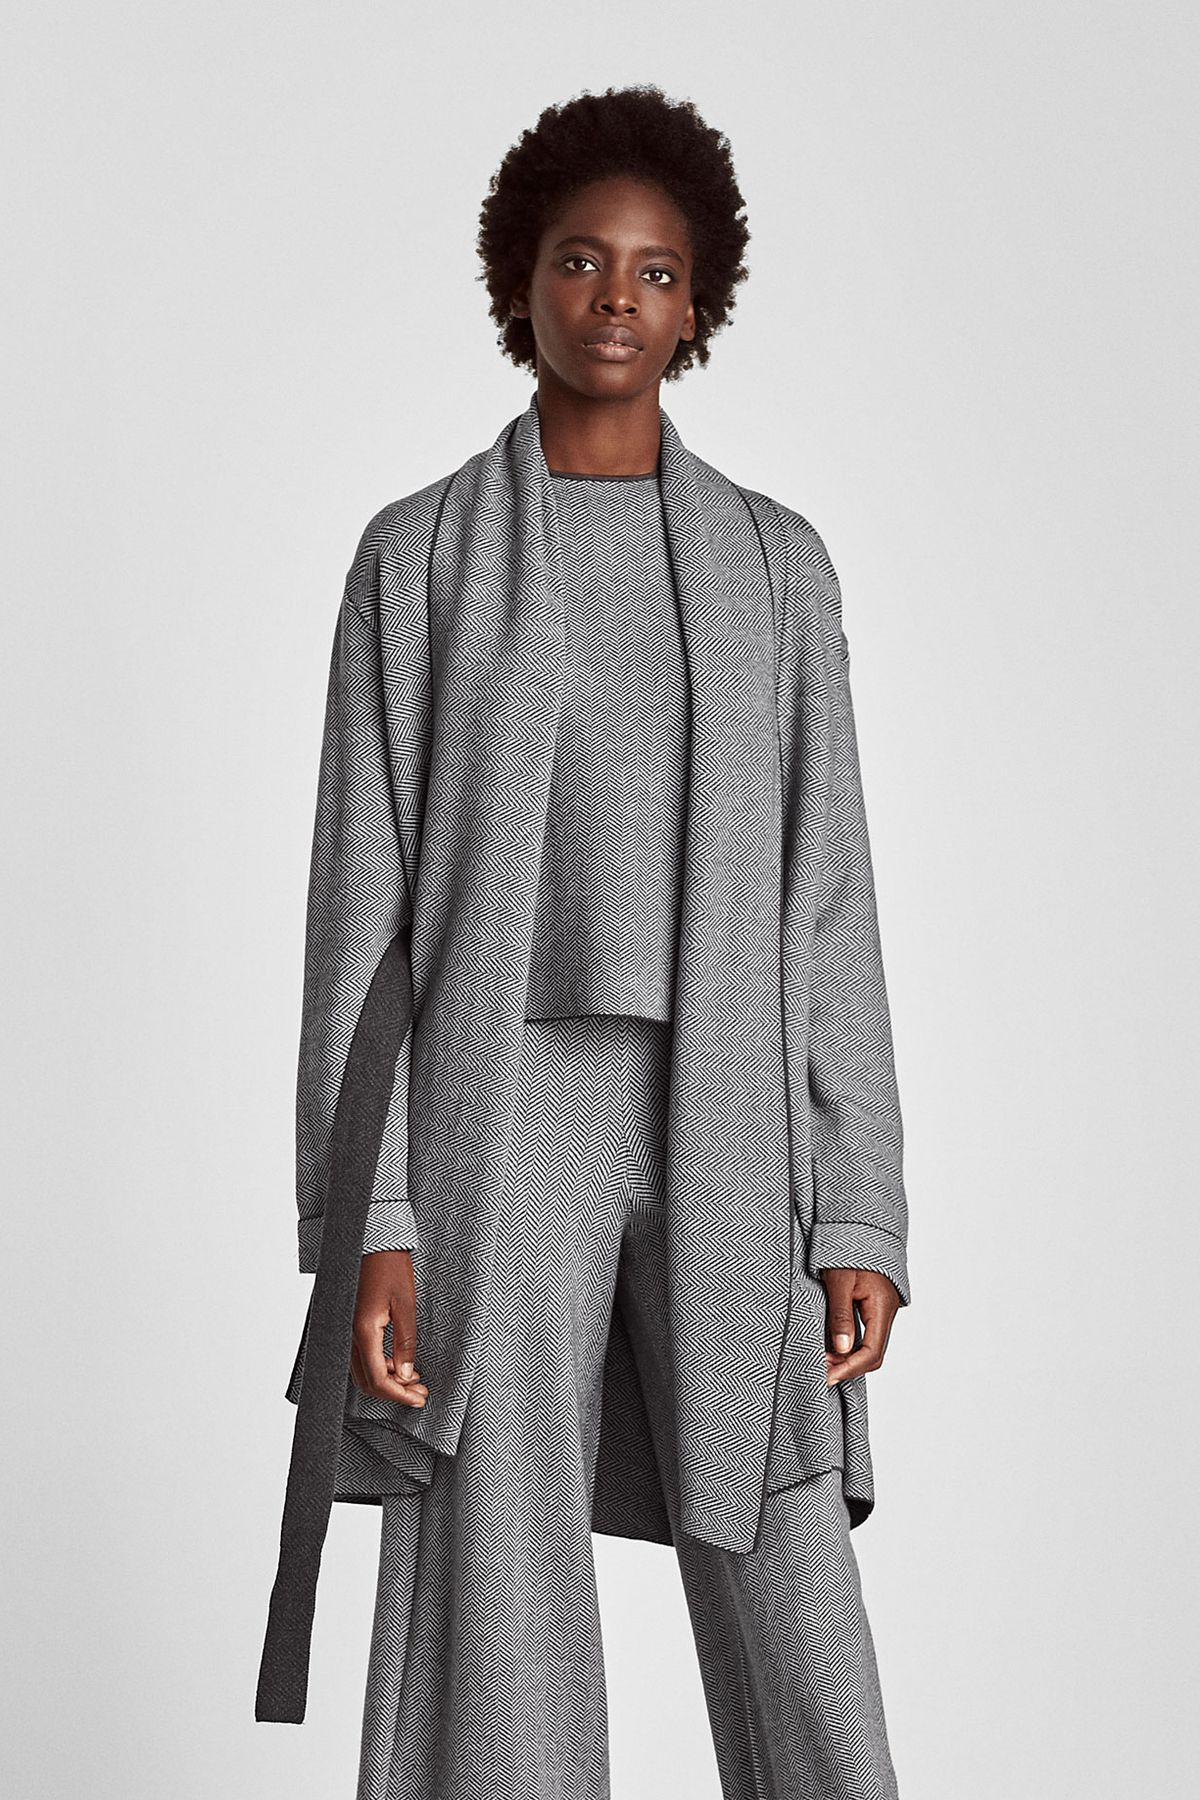 Where To Buy Sweater Coats Aka Coatigans Racked